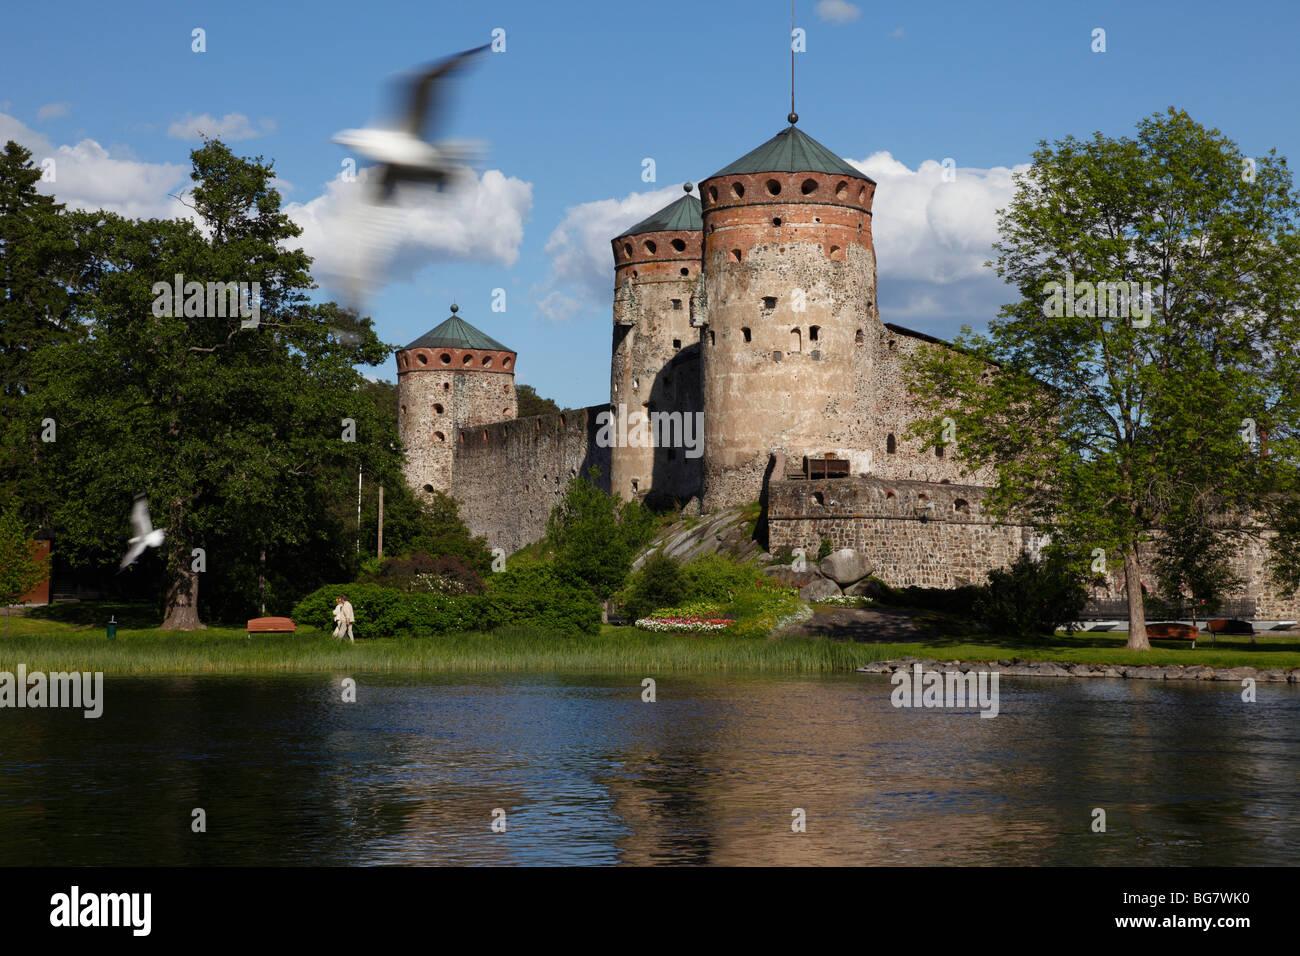 Finland Region of Southern Savonia Saimaa Lake District Savonlinna Kyronsalmi Straits Olavinlinna Medieval Castle - Stock Image